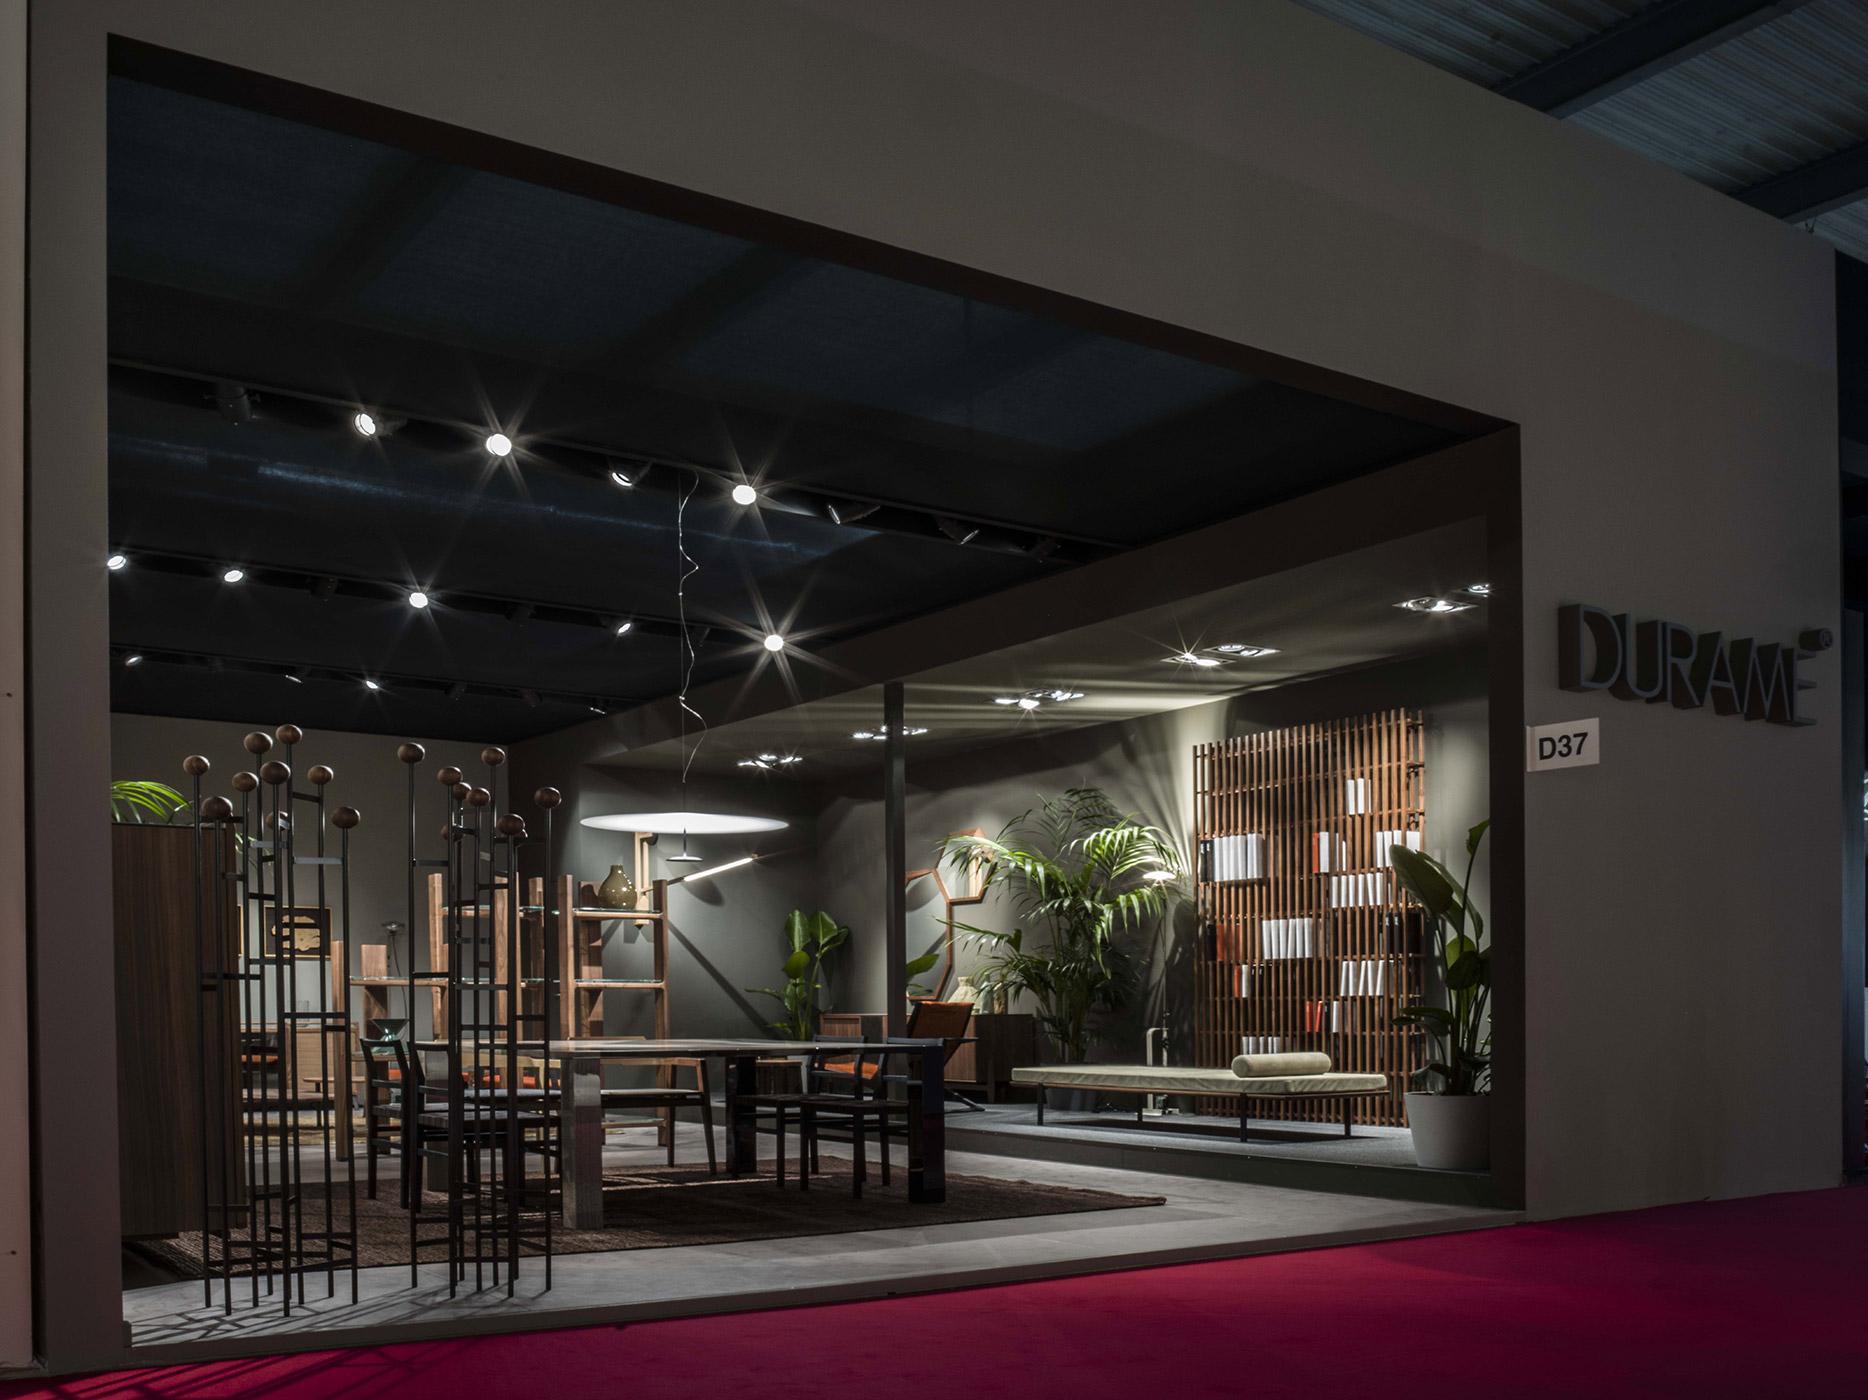 DURAME-salone-mi-2019-orizzontale